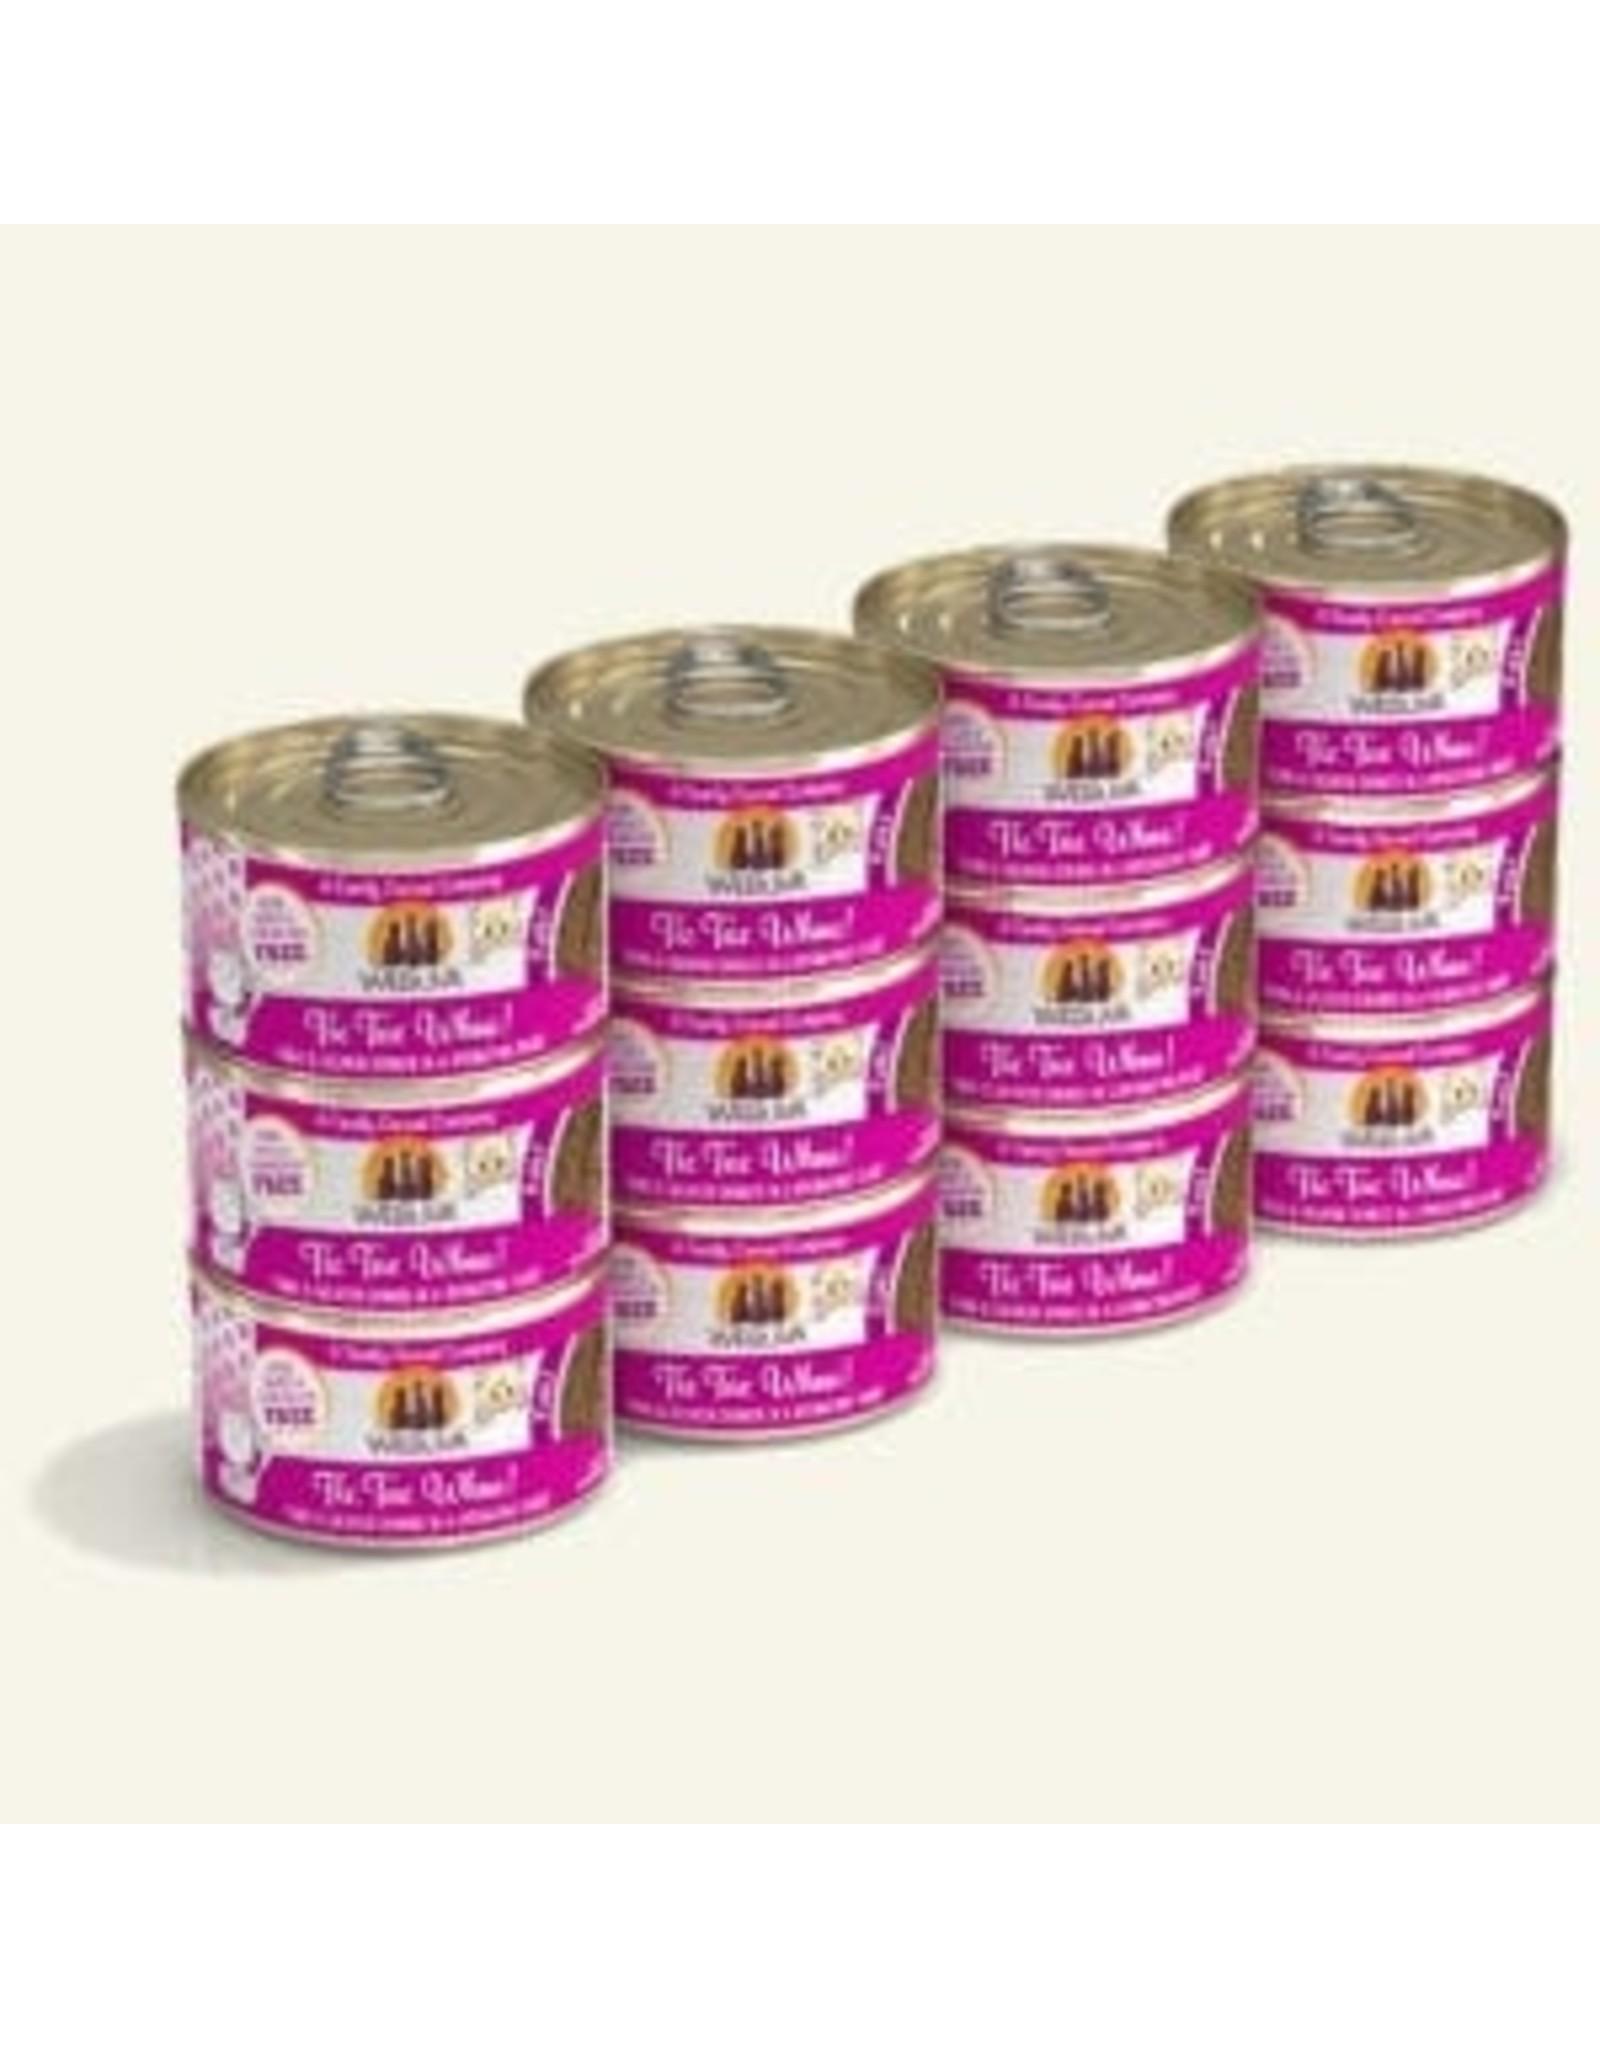 Weruva Weruva Tic Tac Whoa Tuna & Salmon Dinner Pate Cat Food 3oz